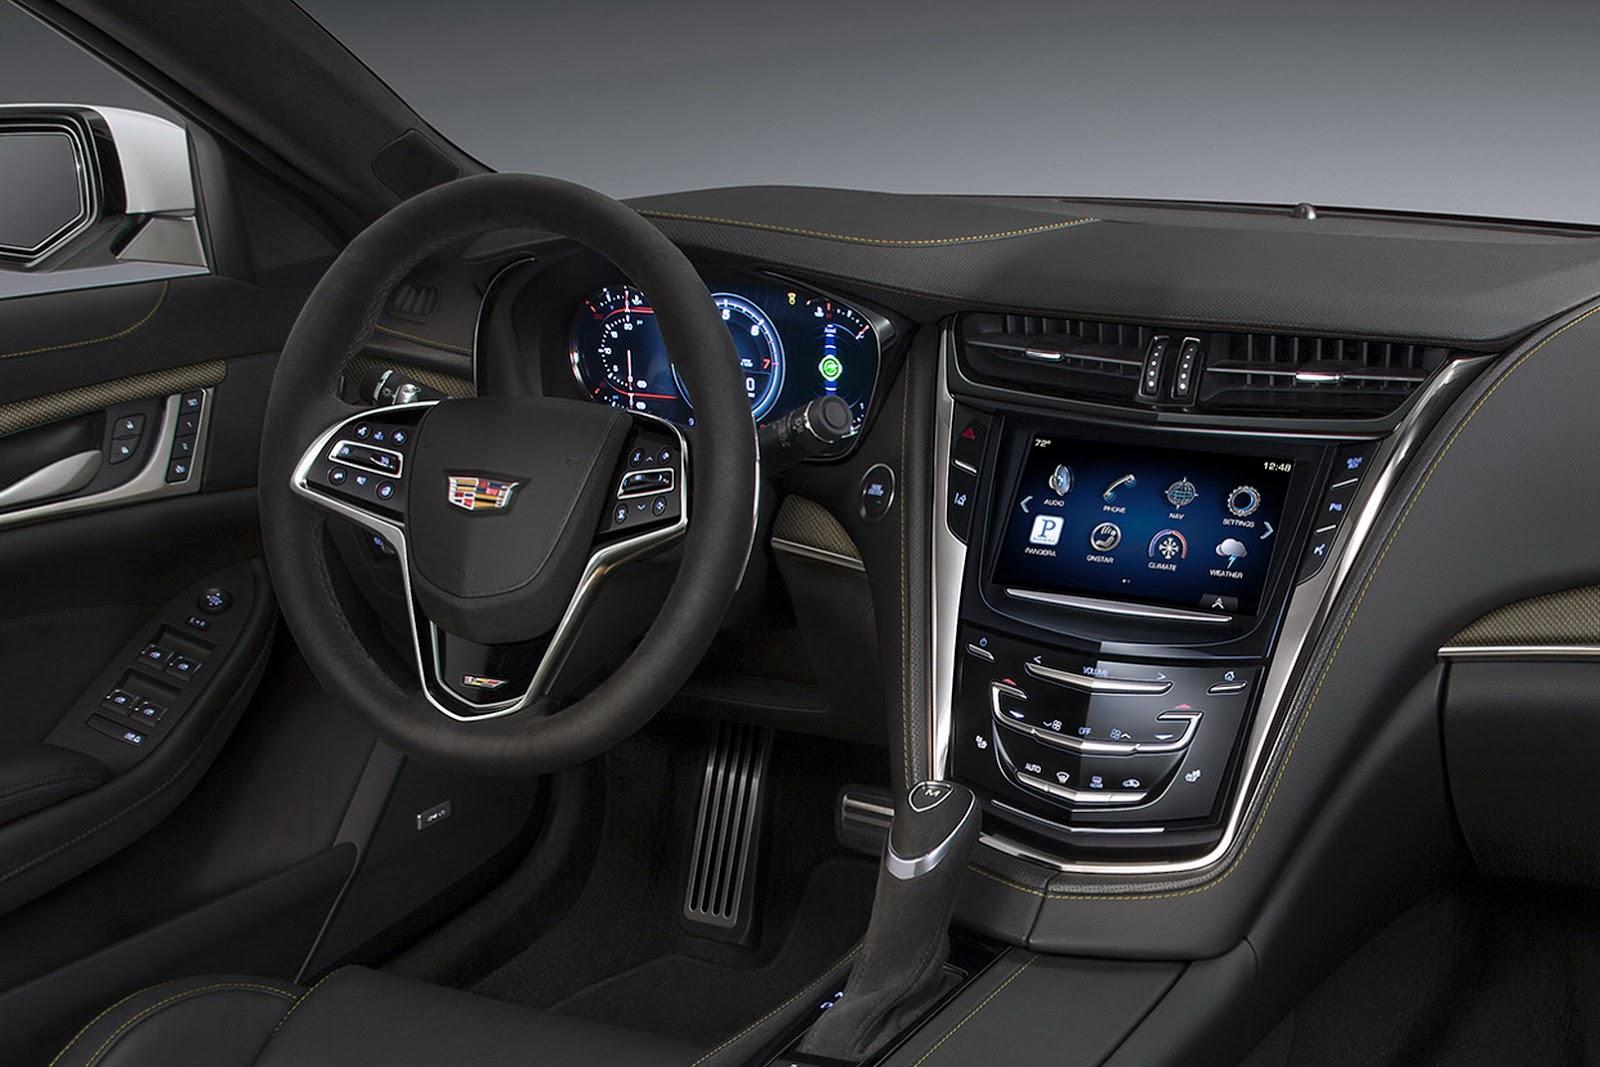 New 2016 Cadillac Cts V Has 640hp Supercharged V8 Reaches